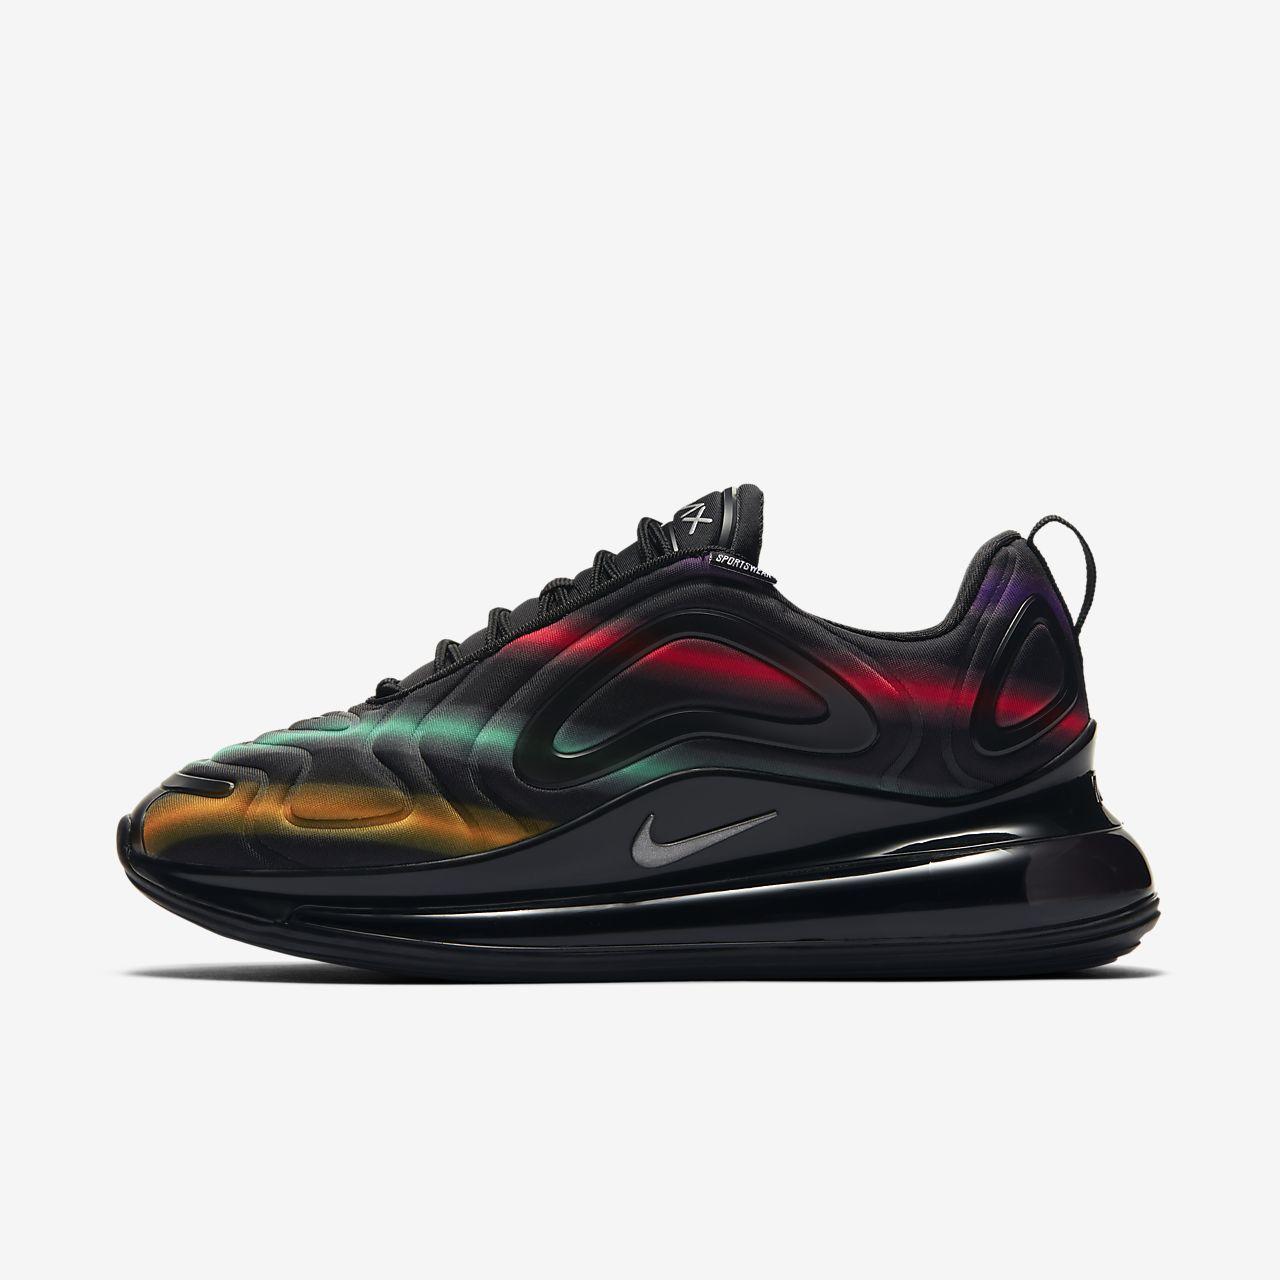 Nike Air Max 720 Be True 2019 Negro Multicolor Ru 7 11 Eur